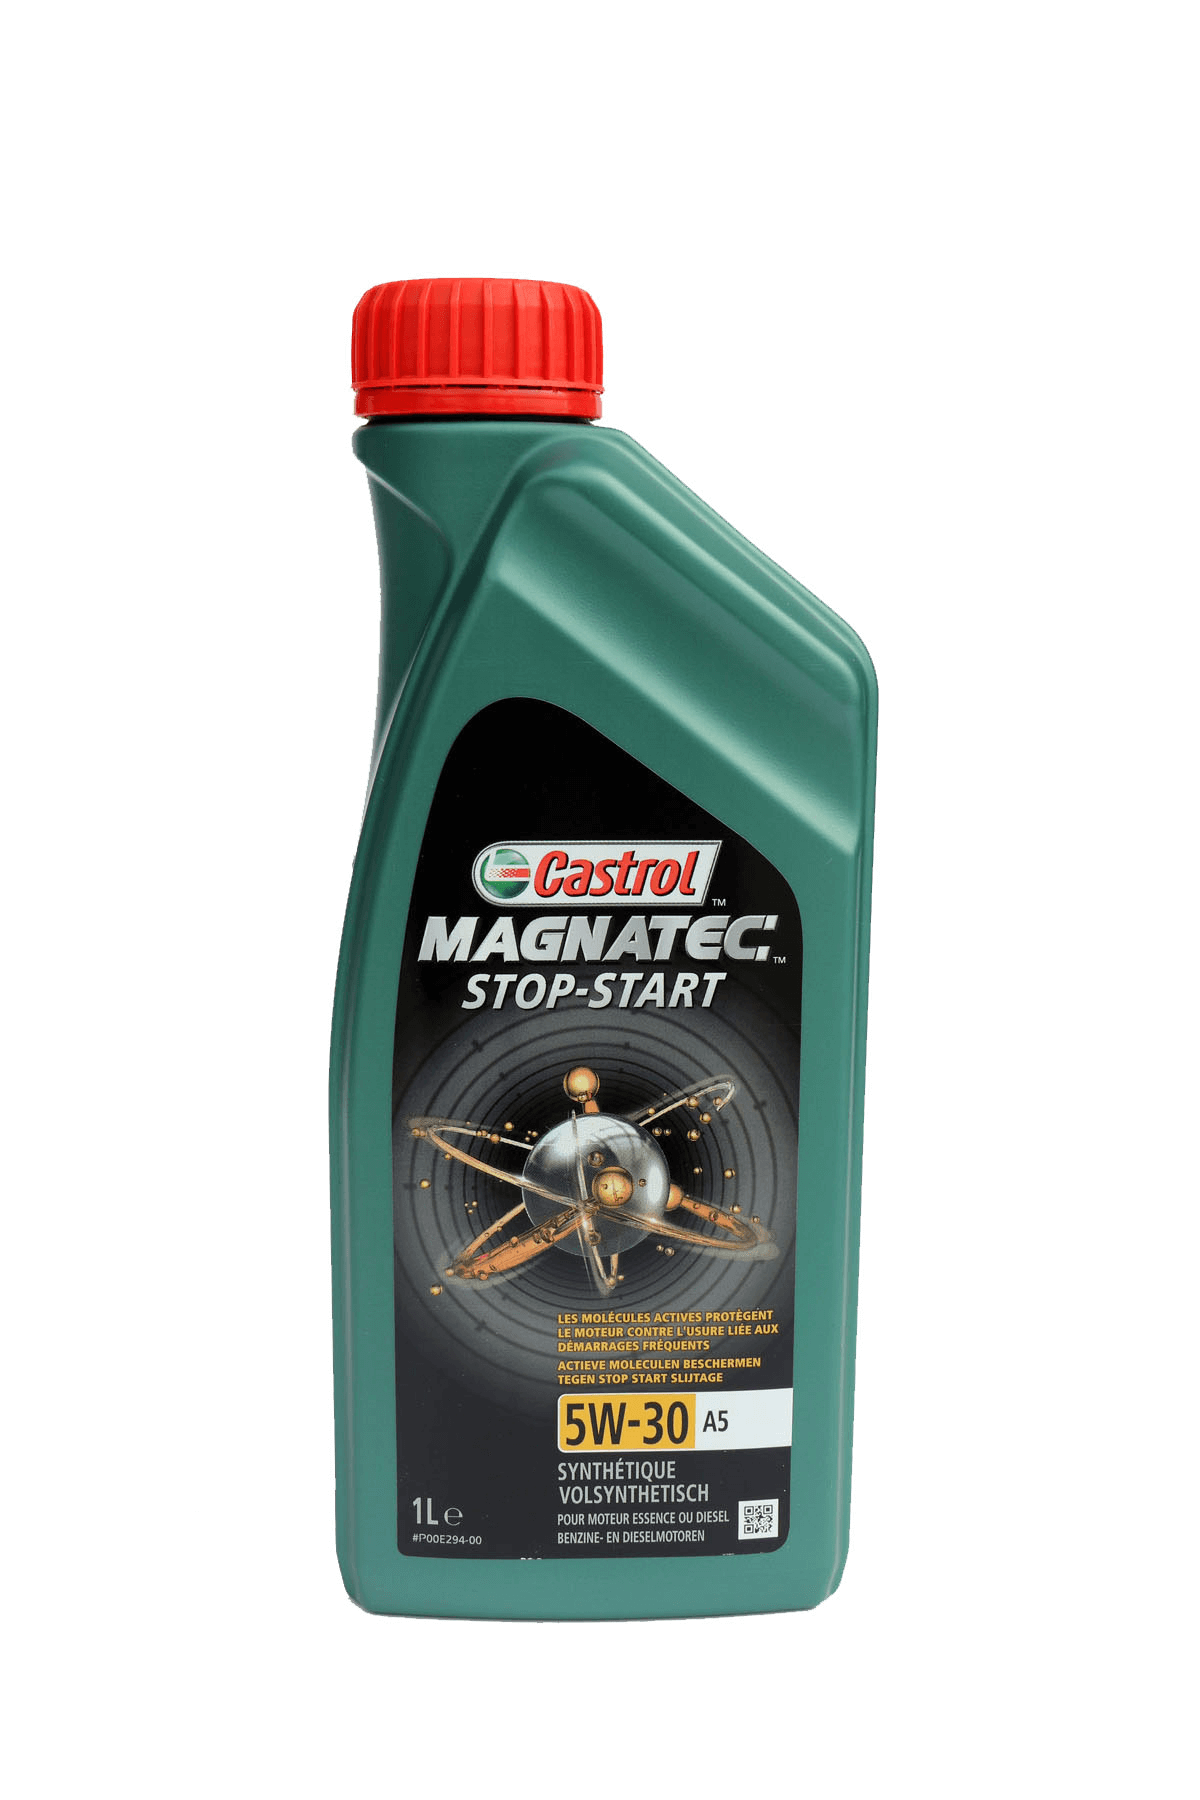 Castrol Magnatec Stop-Start 5W-30 A5 Motoröl, 1l